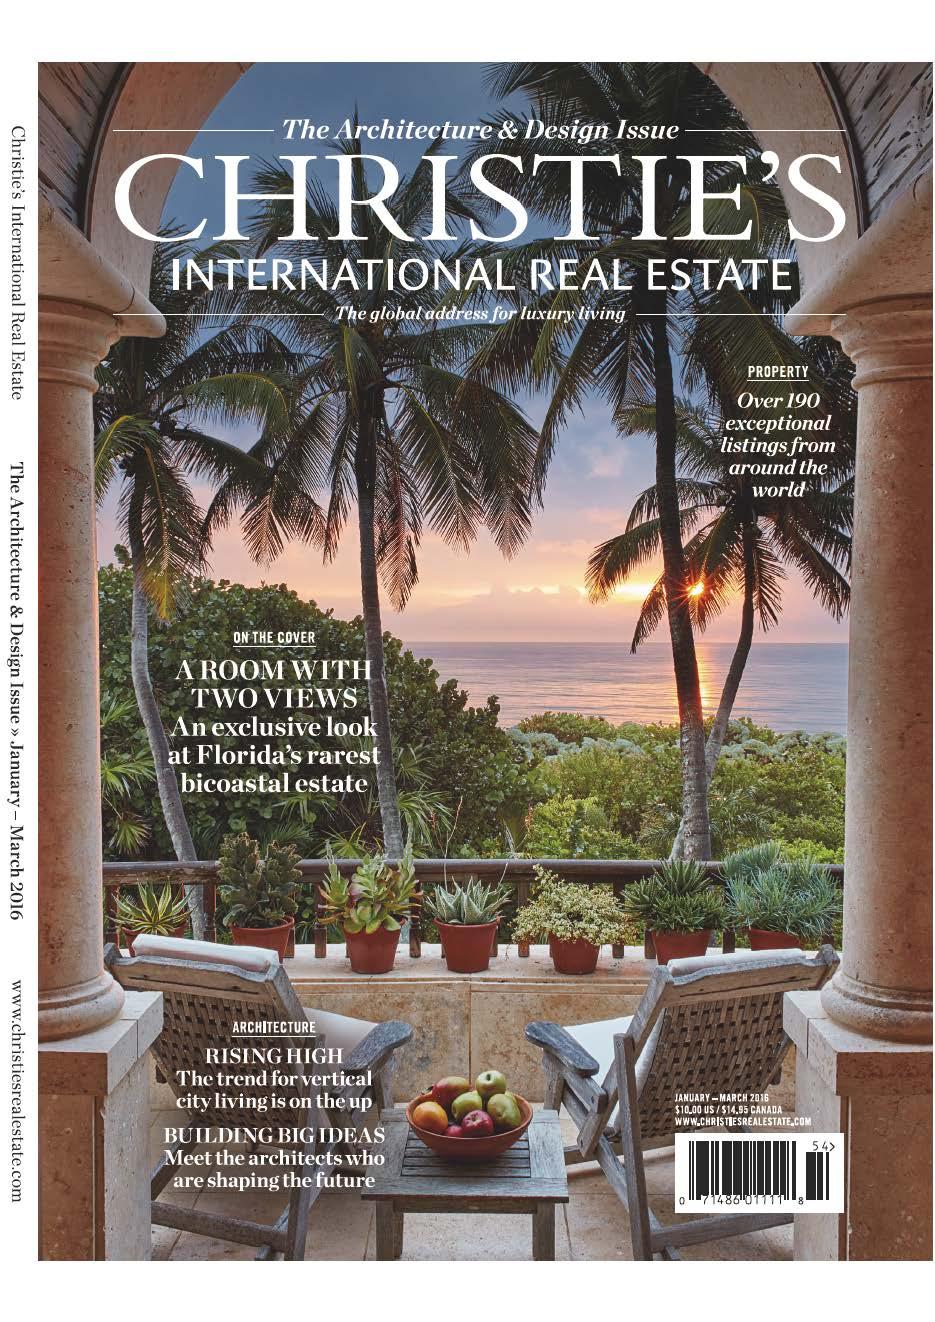 Christies International Real Estate - Simon Orrell Design - Avila - JanuaryMarch 2016-1_Page_1